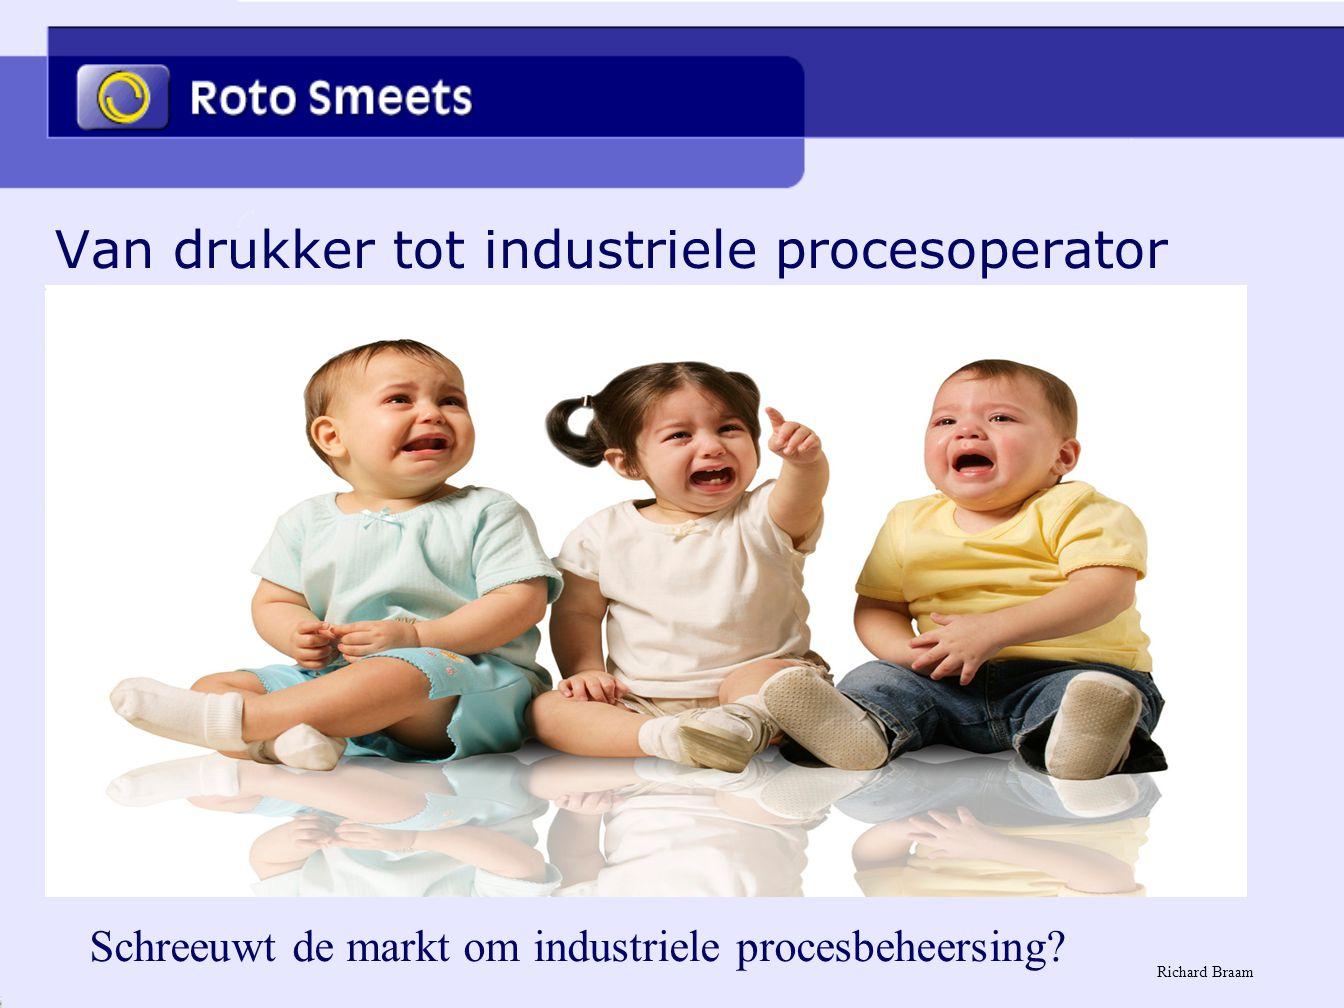 Van drukker tot industriele procesoperator